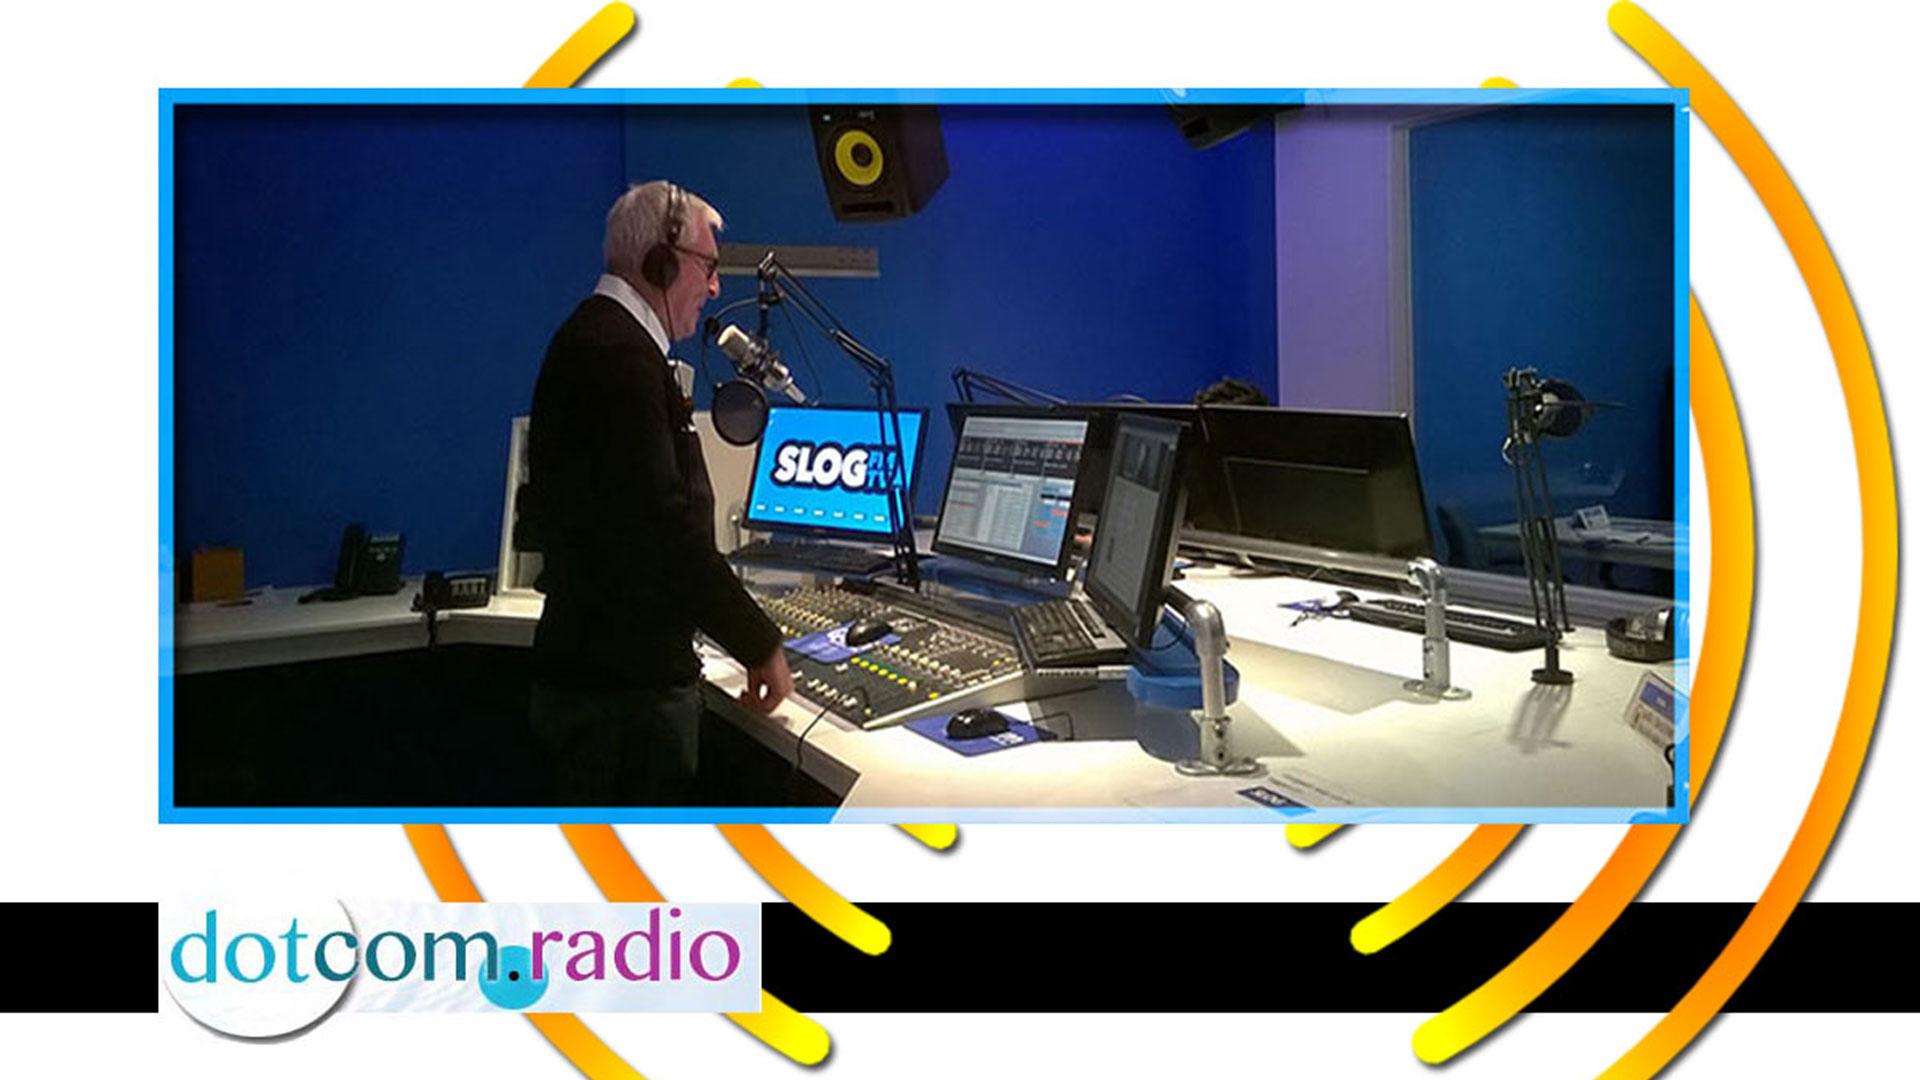 dotcom.radio livestream